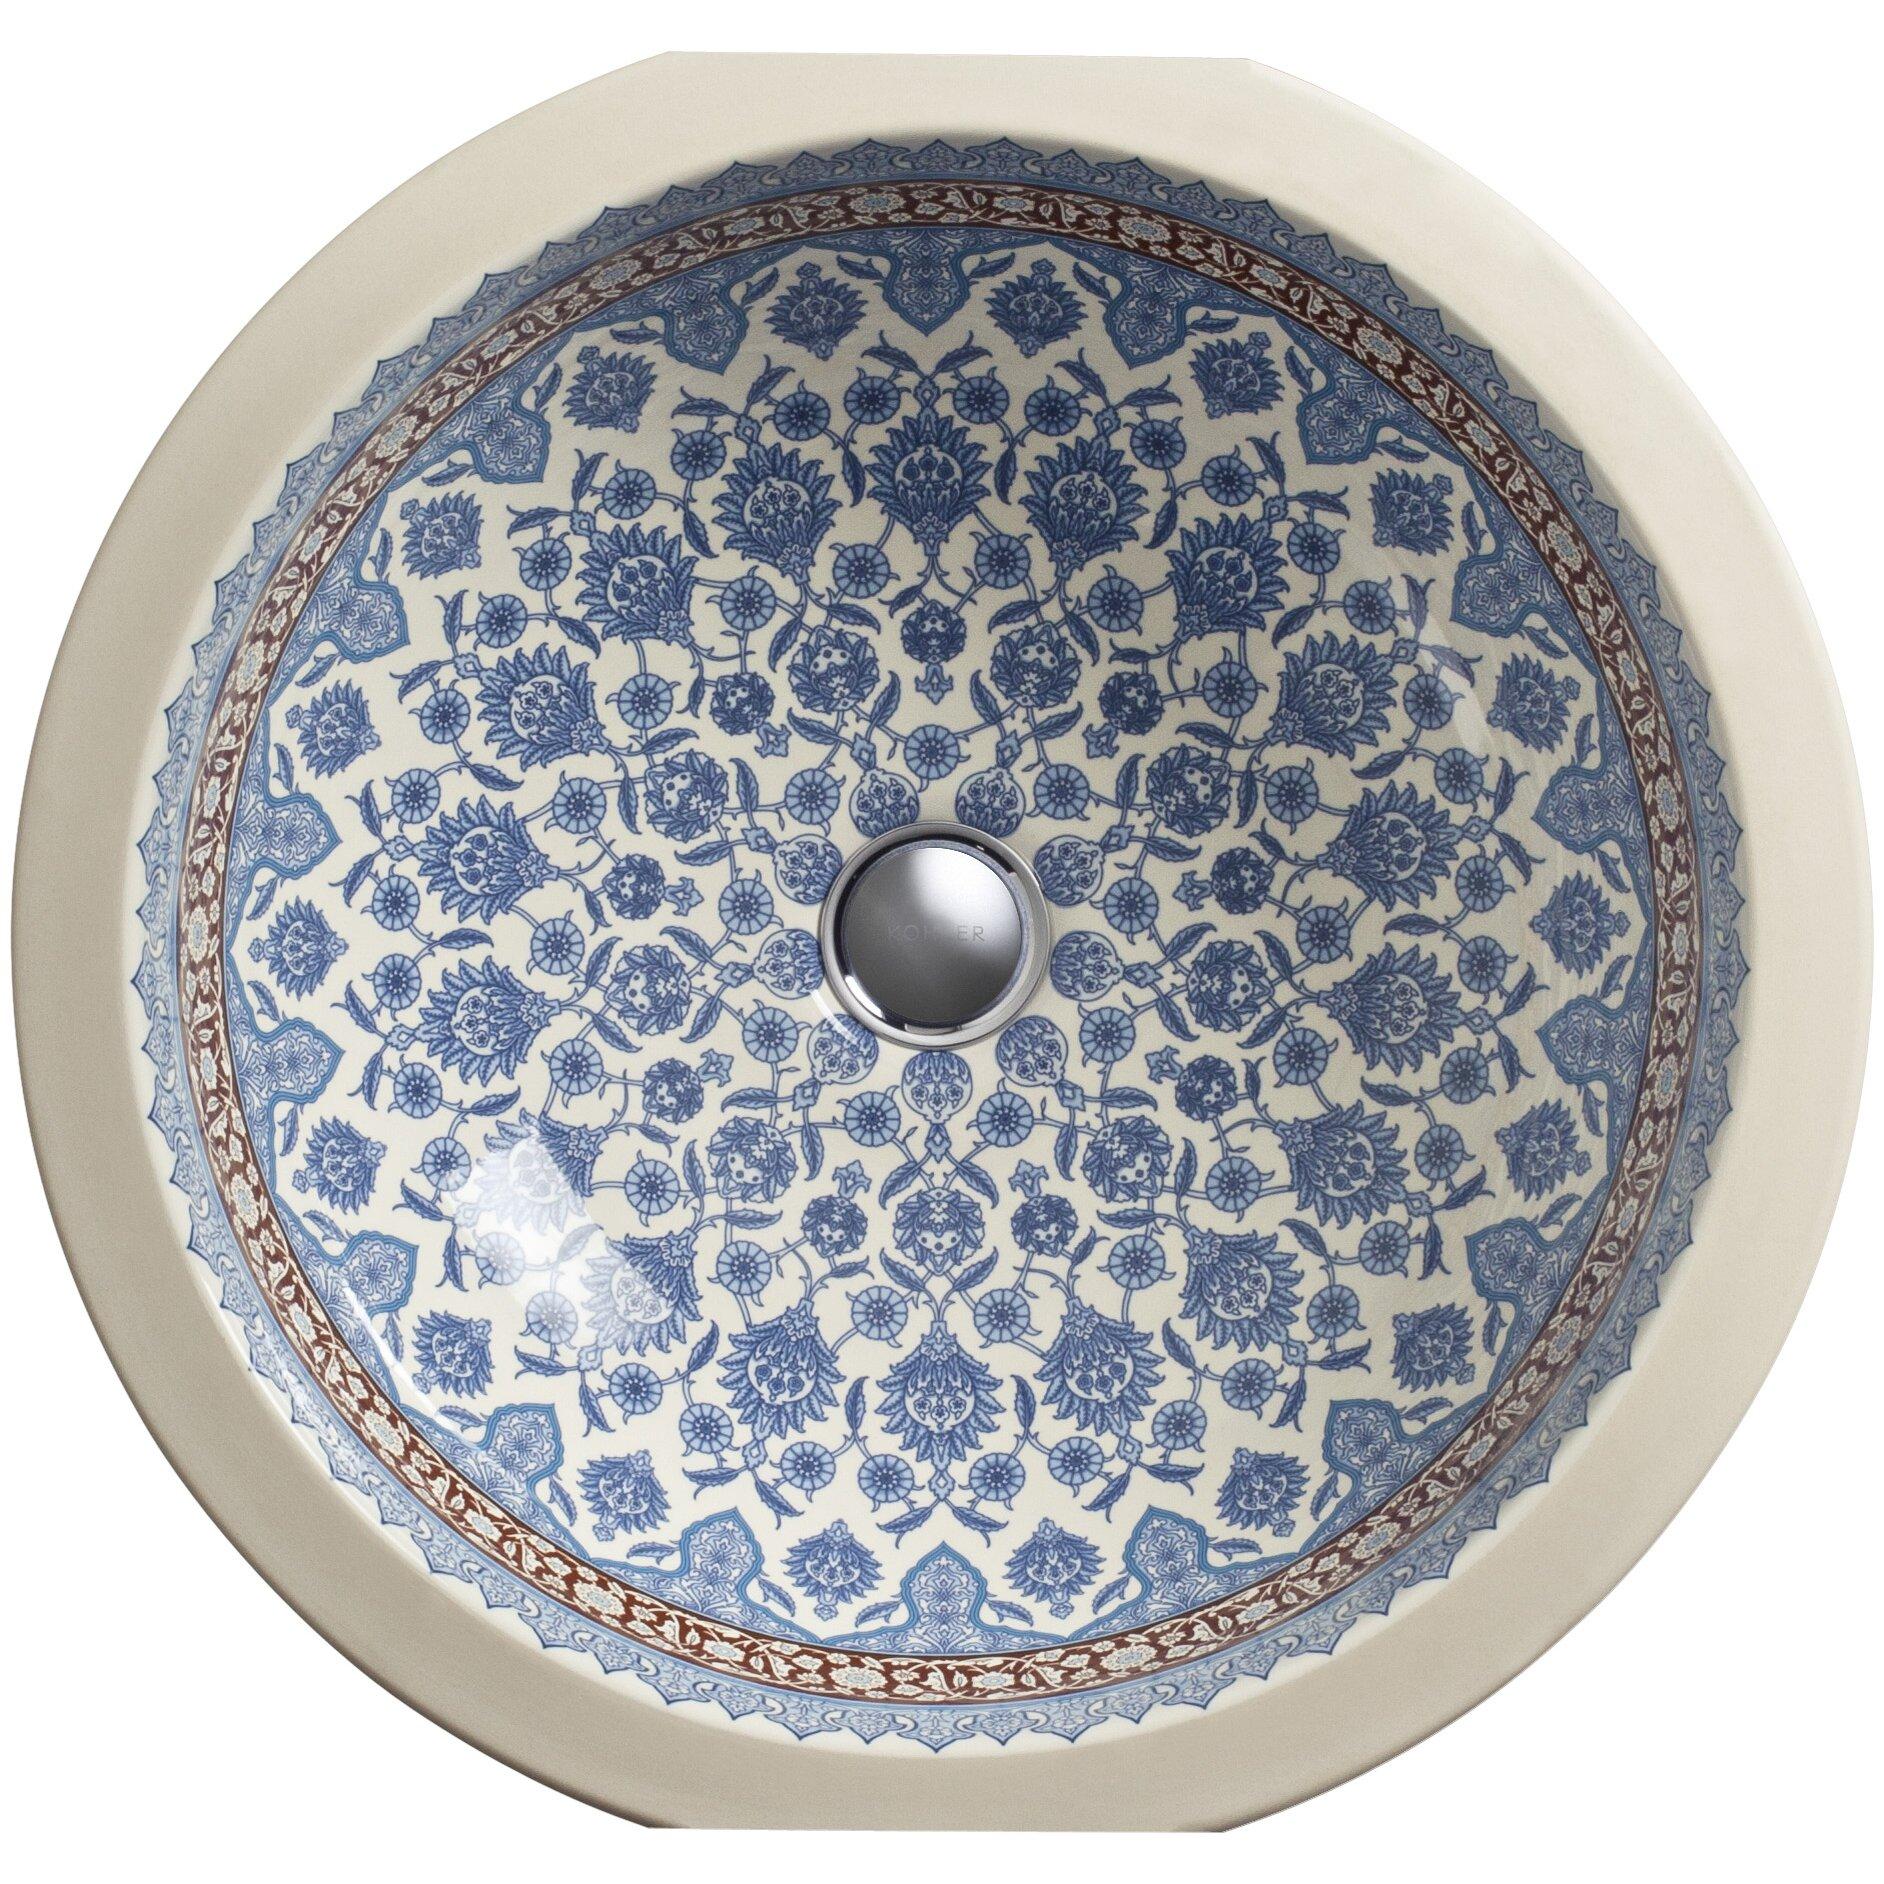 Kohler Marrakesh Design On Camber Undermount Bathroom Sink